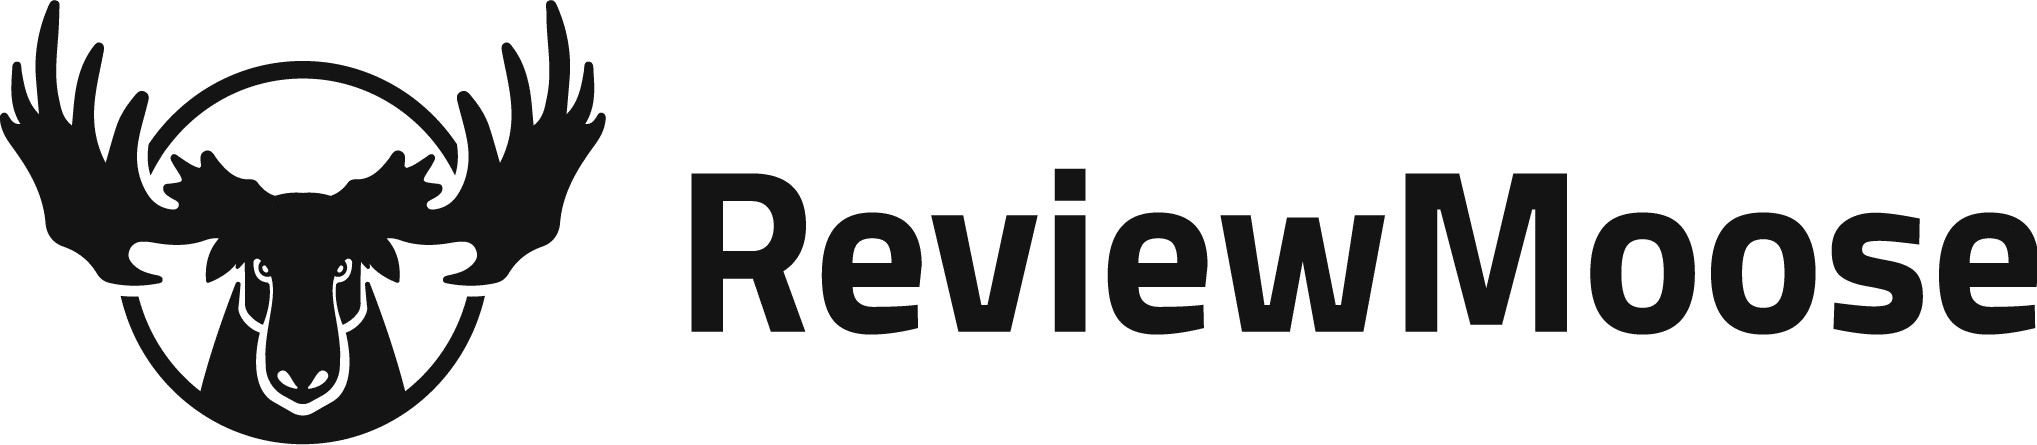 ReviewMoose.ca